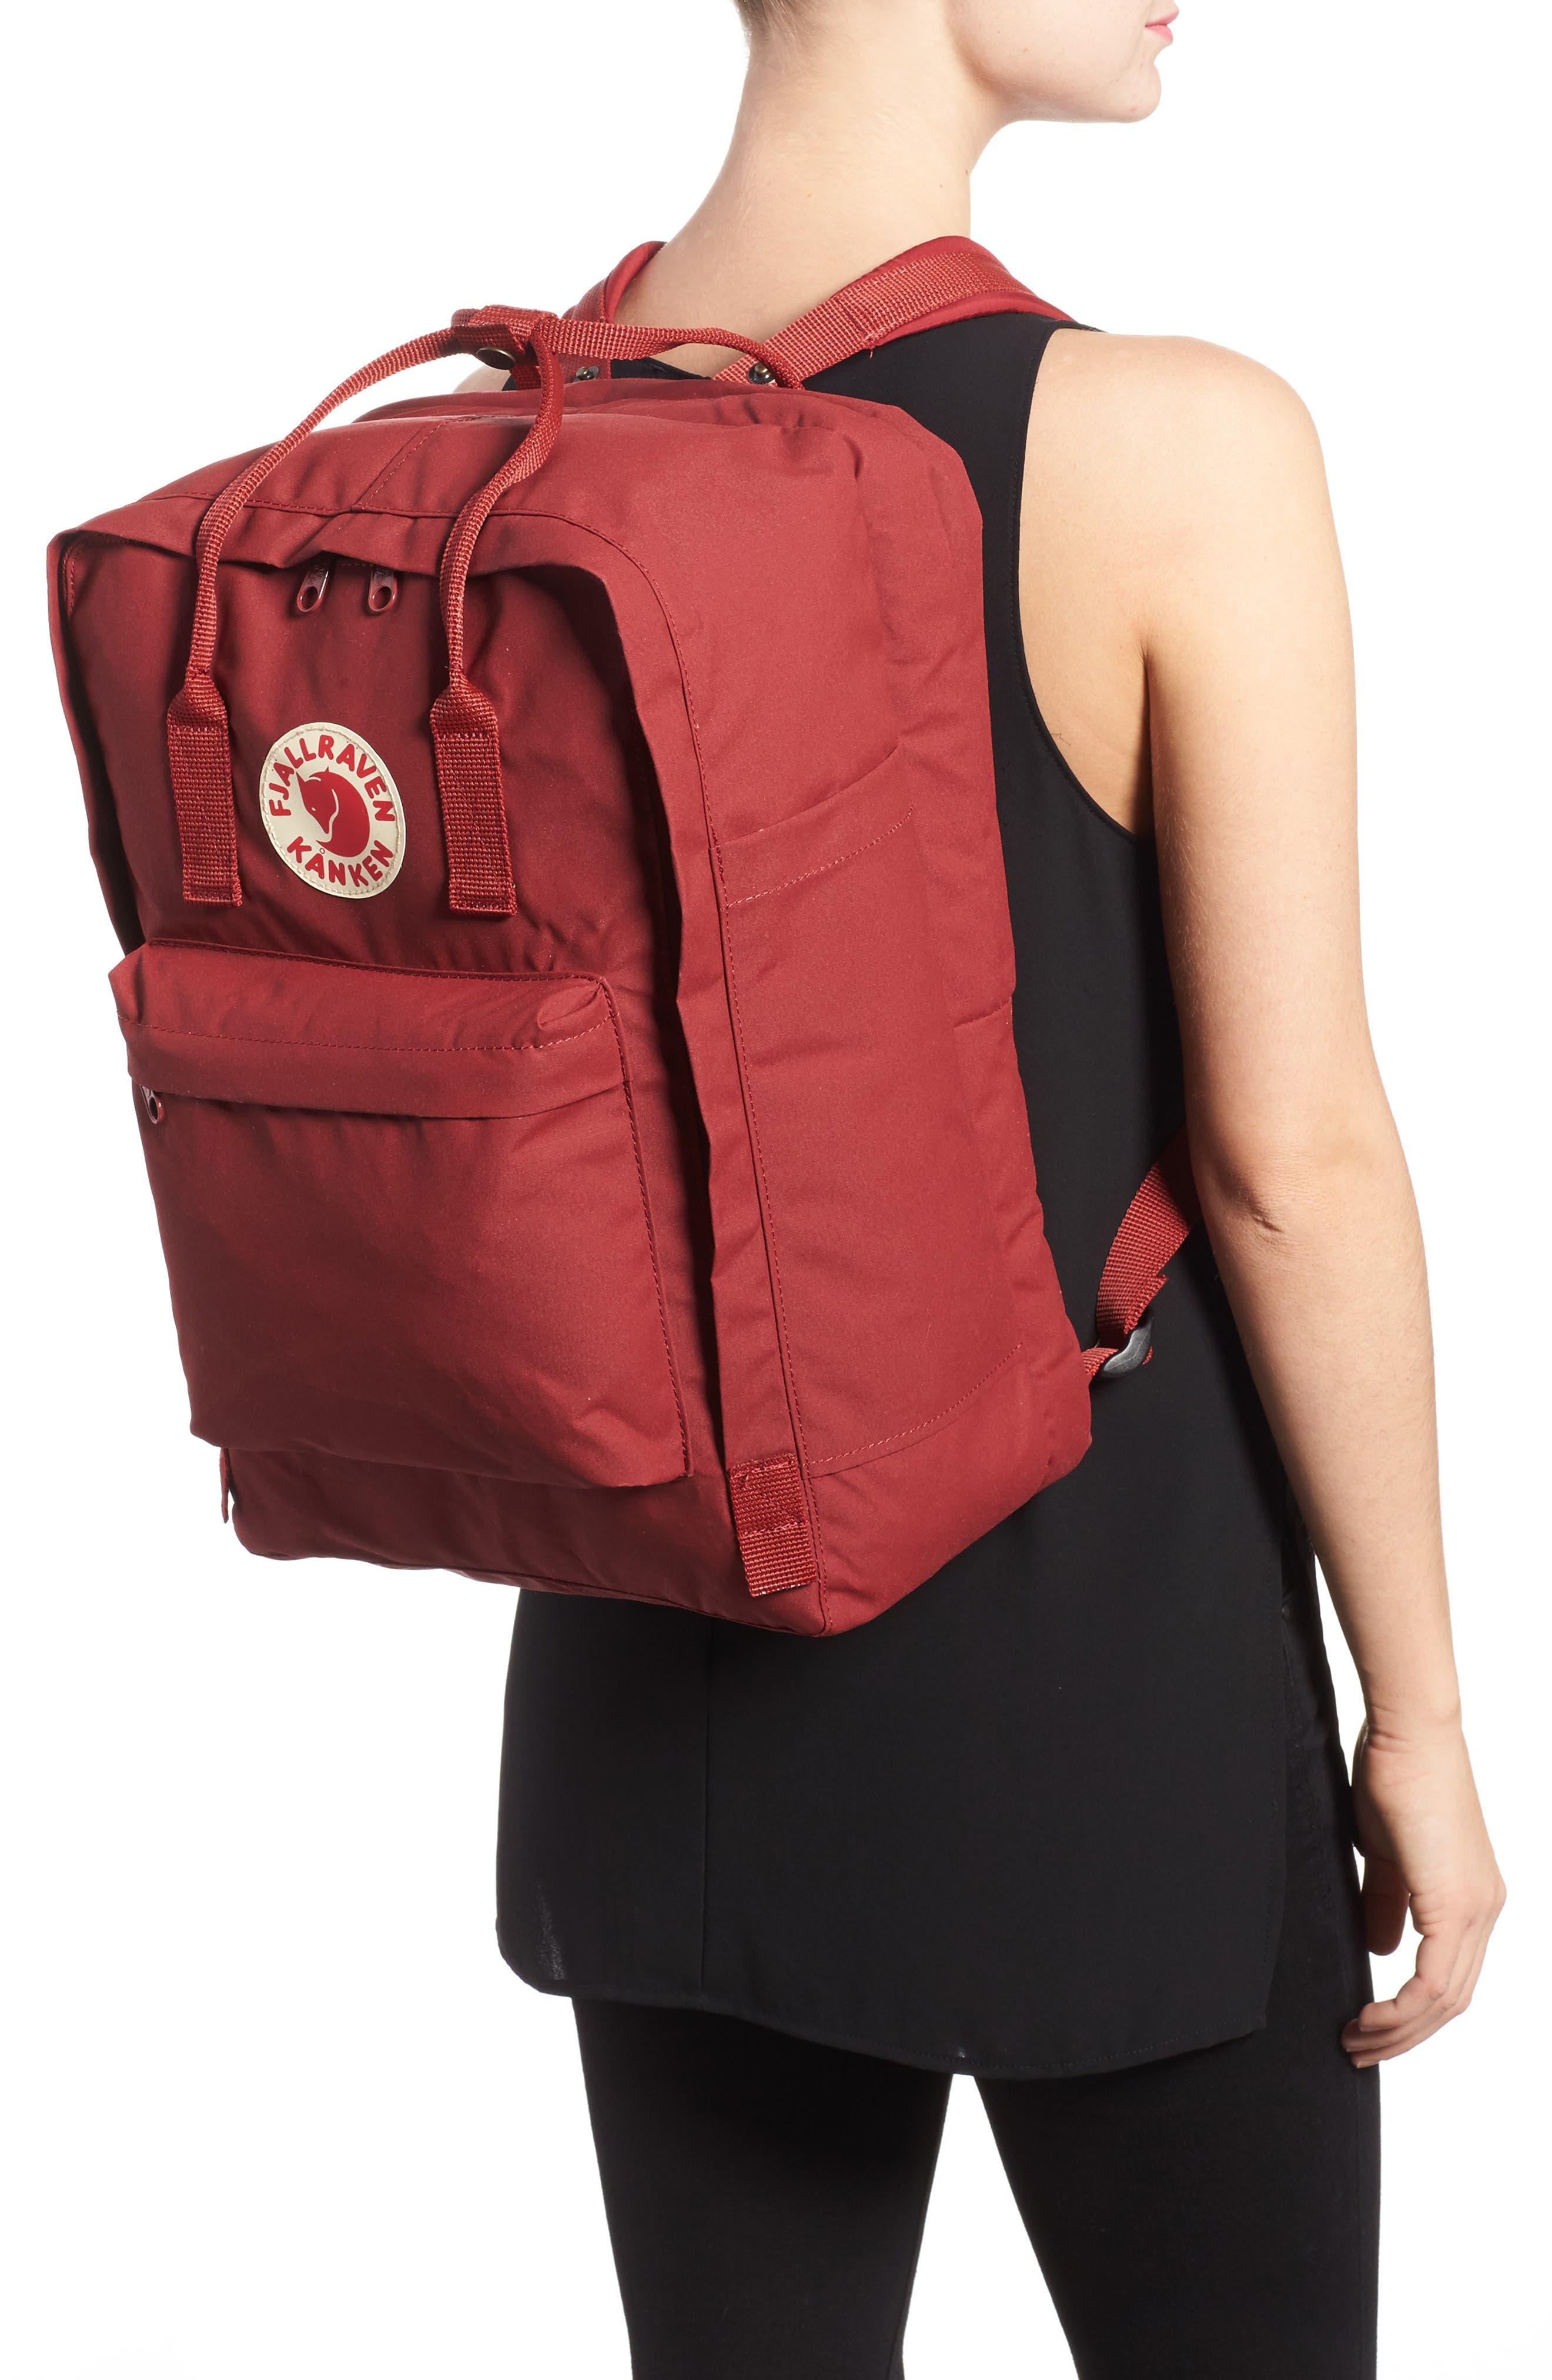 Alternate Image 2  - Fjällräven 'Kånken' Laptop Backpack (17 Inch)